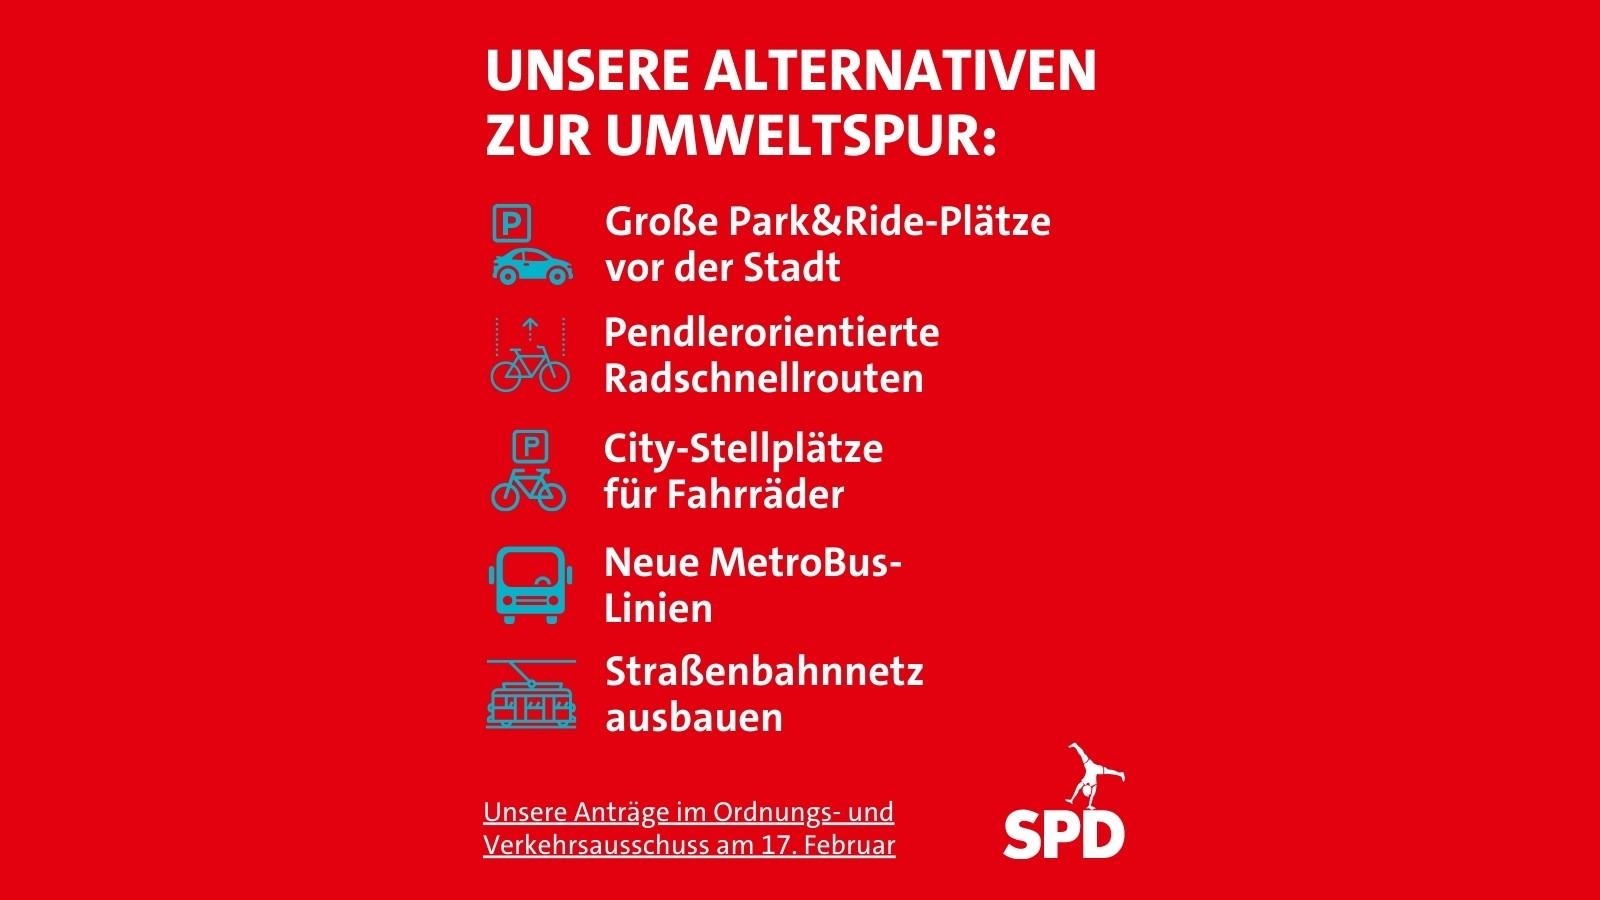 spd-alternativen_umweltspur